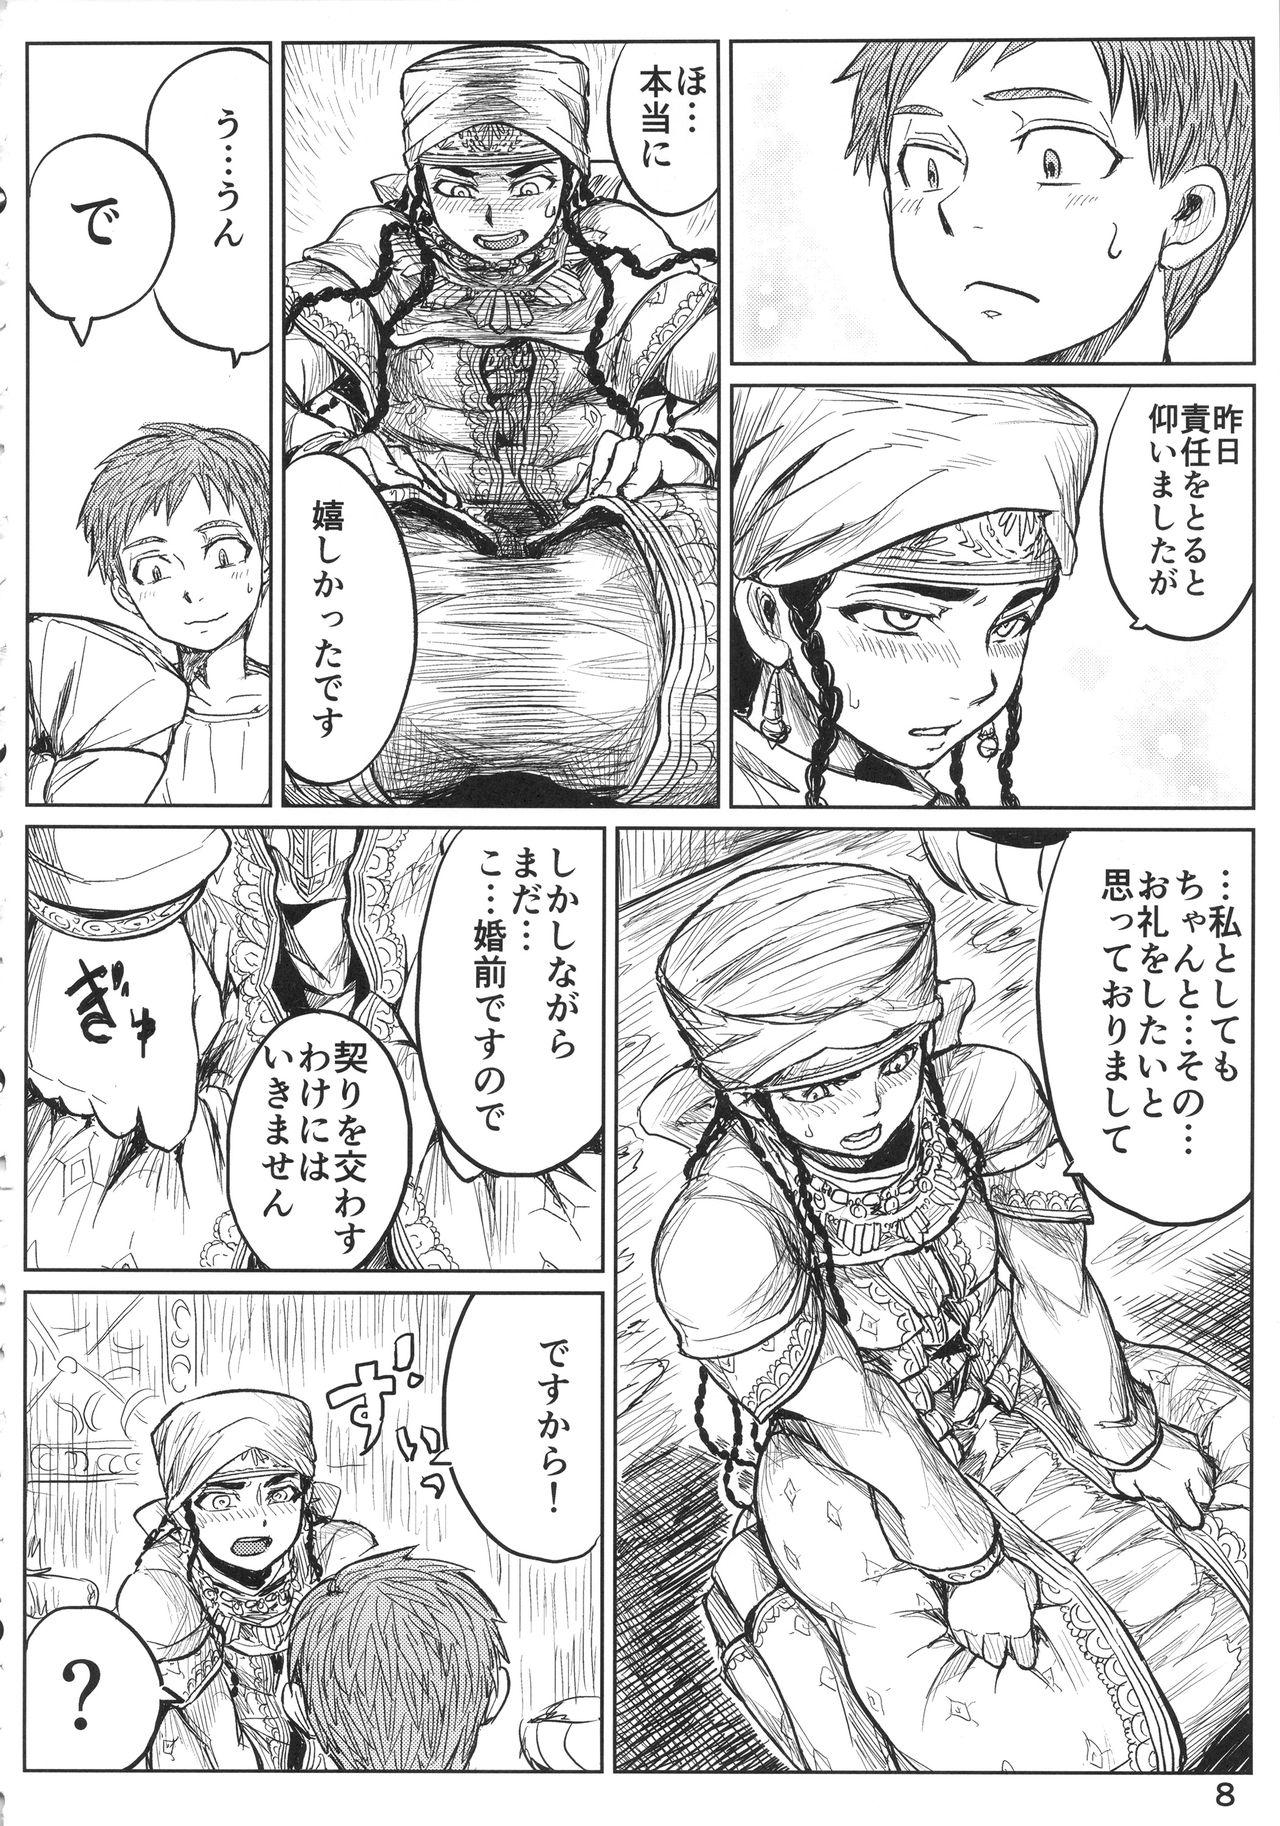 Yomedameshi 6